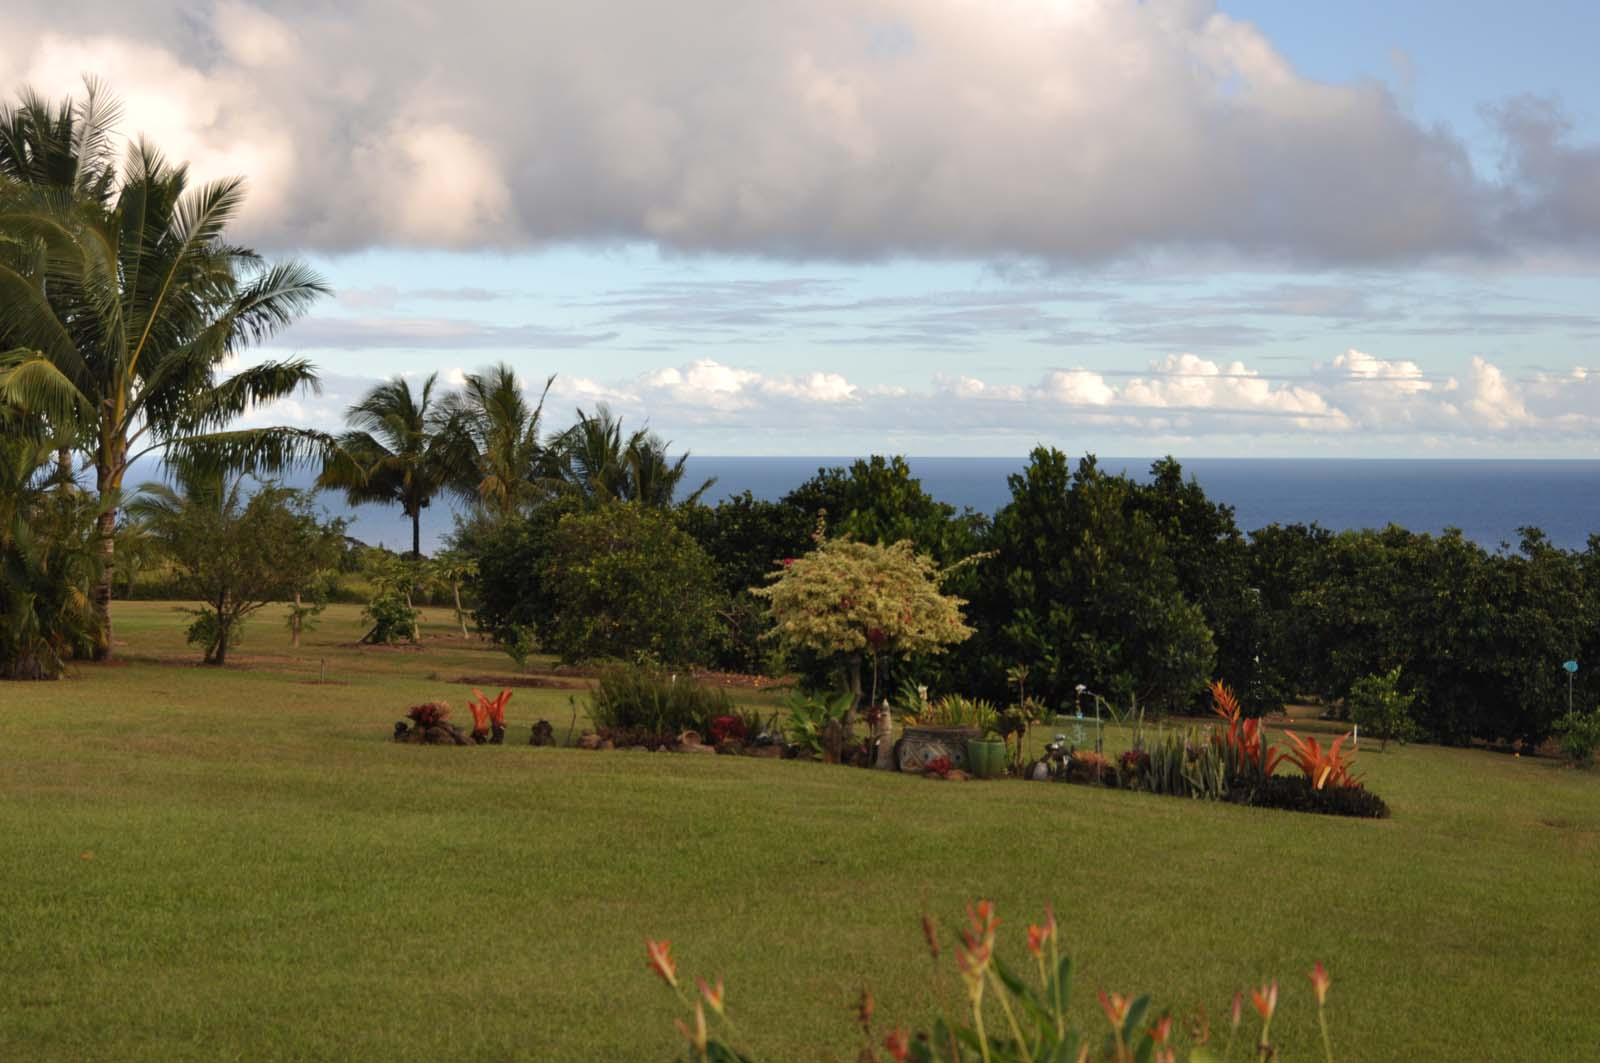 022_maui_hawaii_island